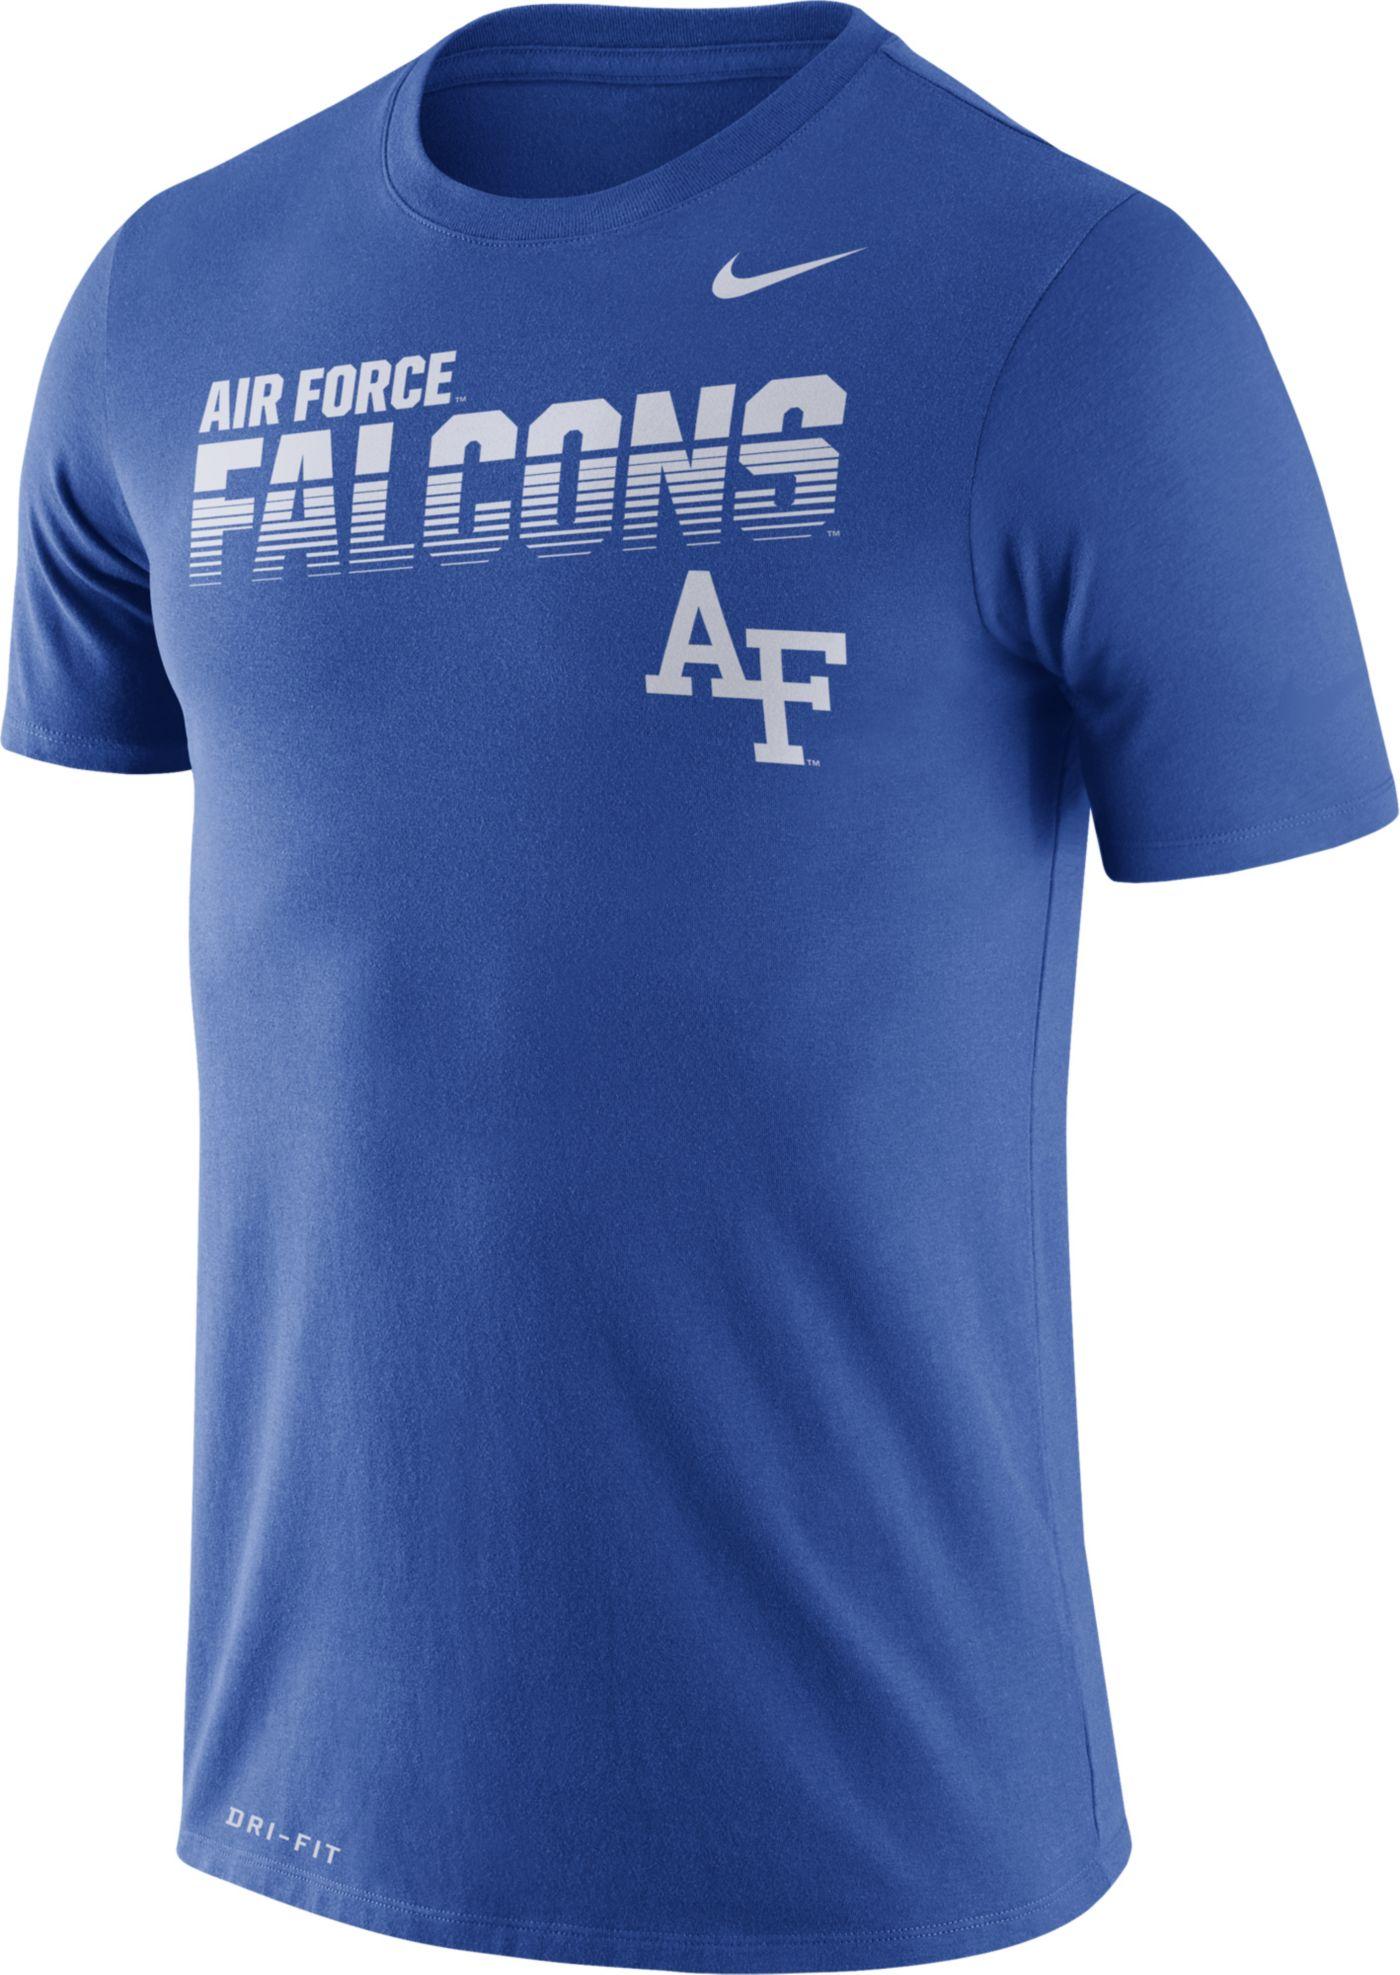 Nike Men's Air Force Falcons Blue Legend Football Sideline T-Shirt